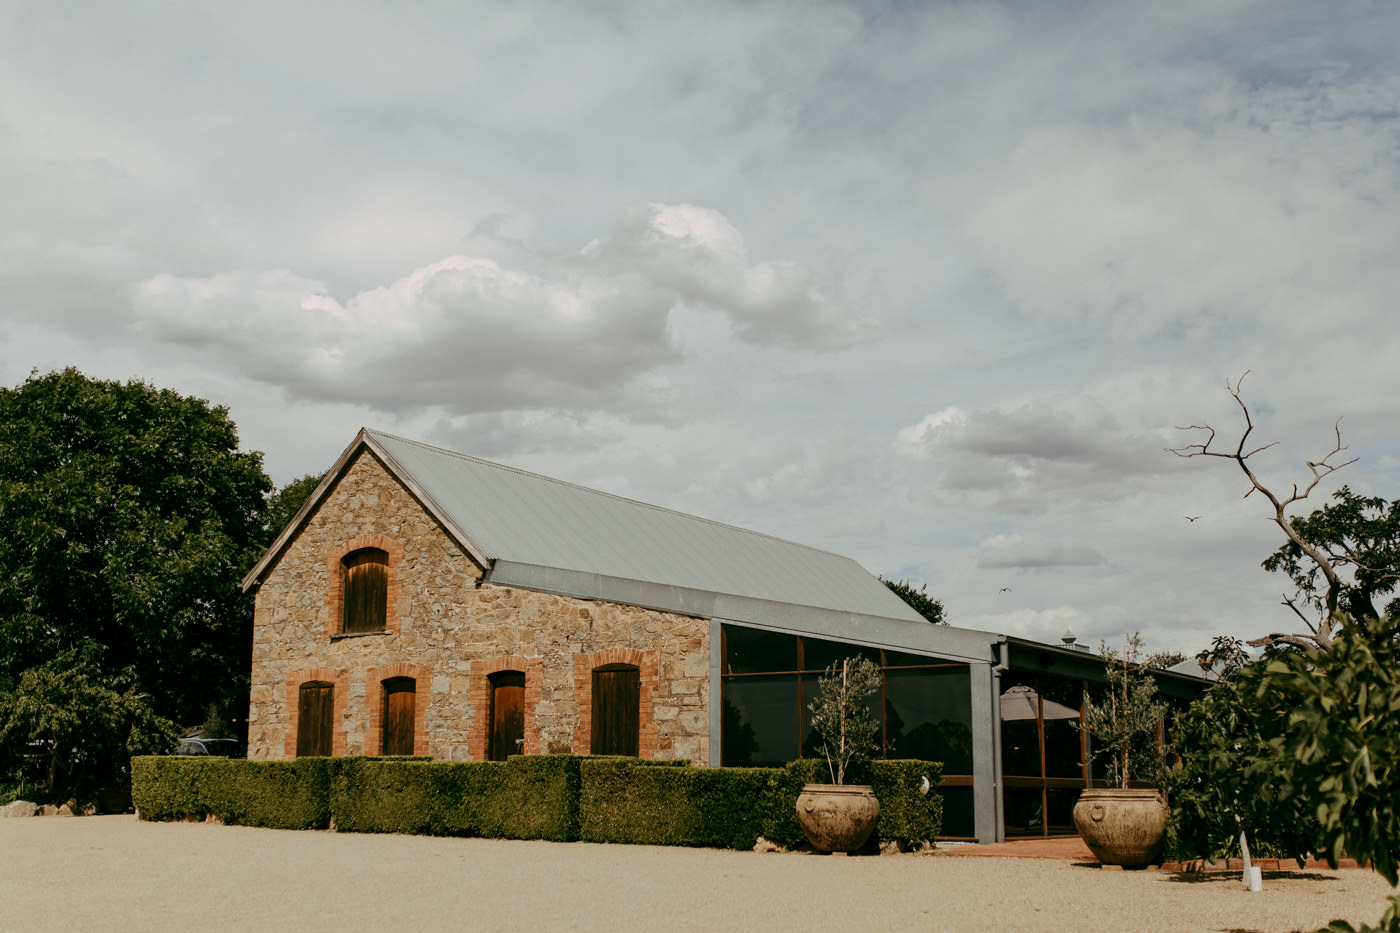 Anthony & Eliet - Wagga Wagga Wedding - Country NSW - Samantha Heather Photography-78.jpg